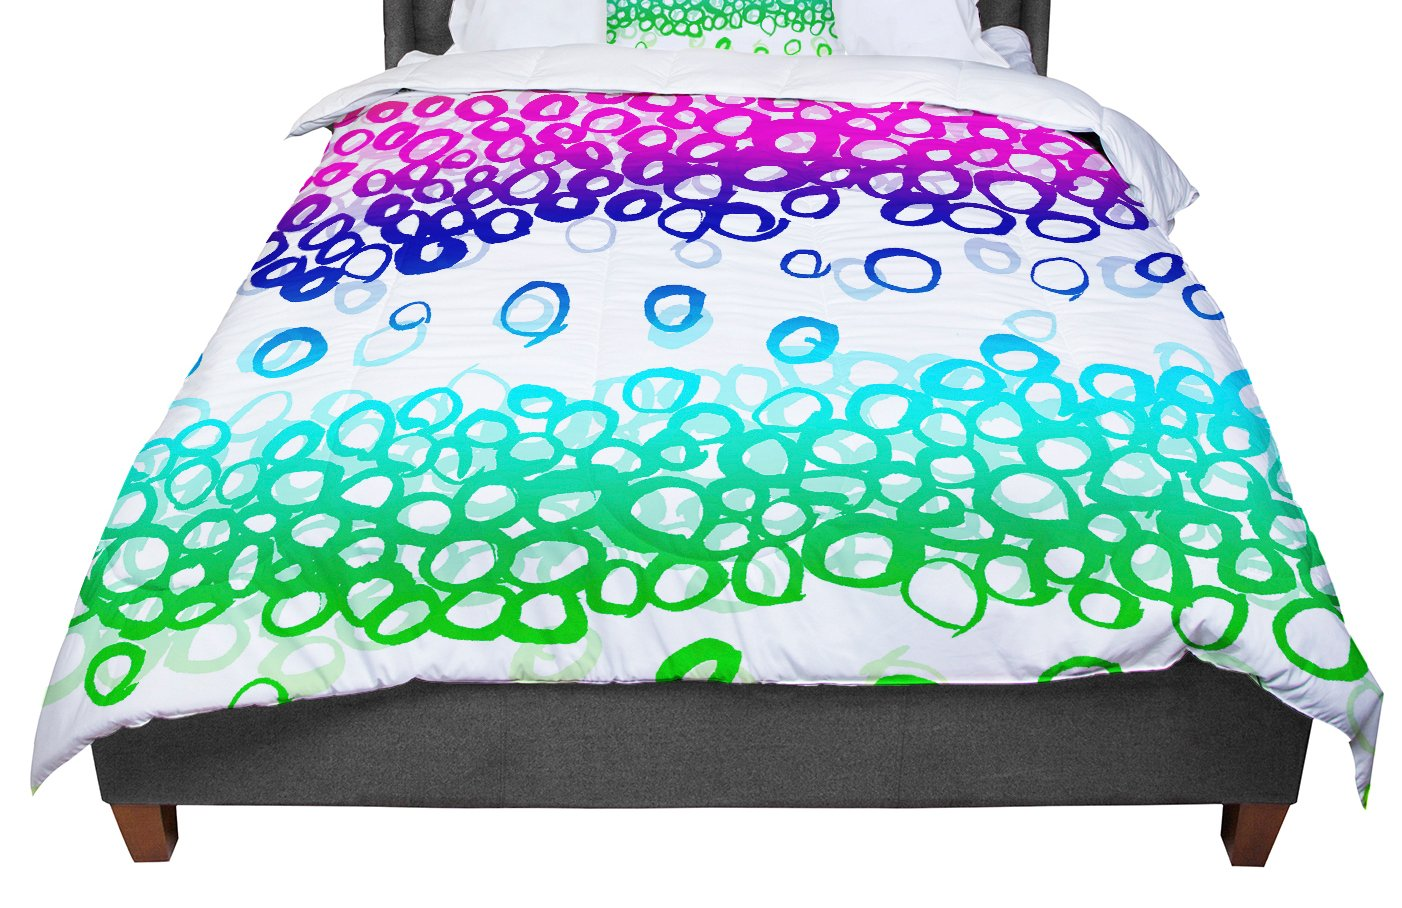 KESS InHouse Emine Ortega 'Pebble Row' Teal Green King / Cal King Comforter, 104' X 88'